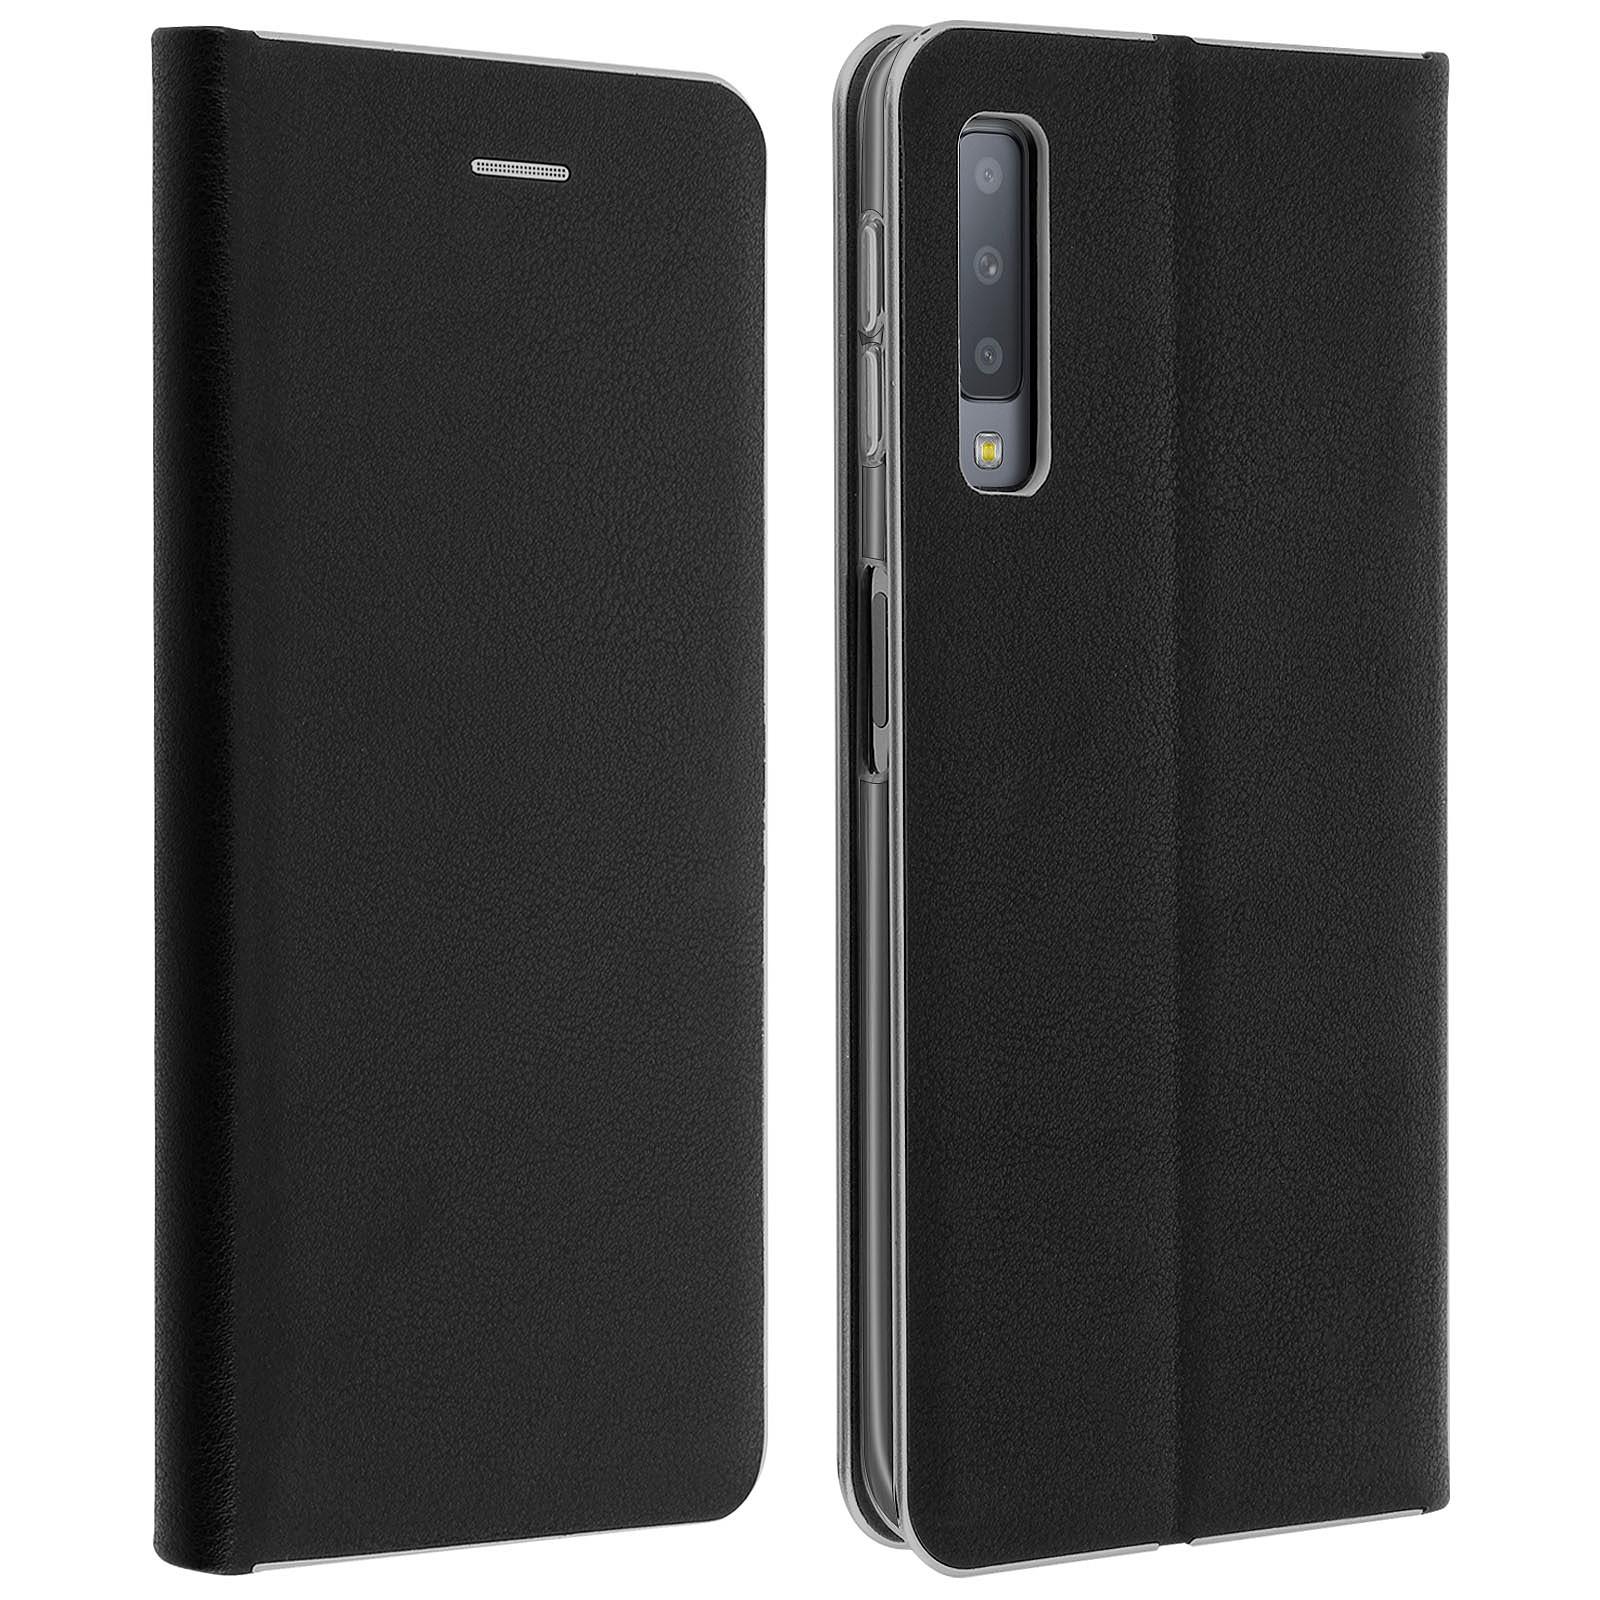 Avizar Etui folio Noir Portefeuille pour Samsung Galaxy A7 2018